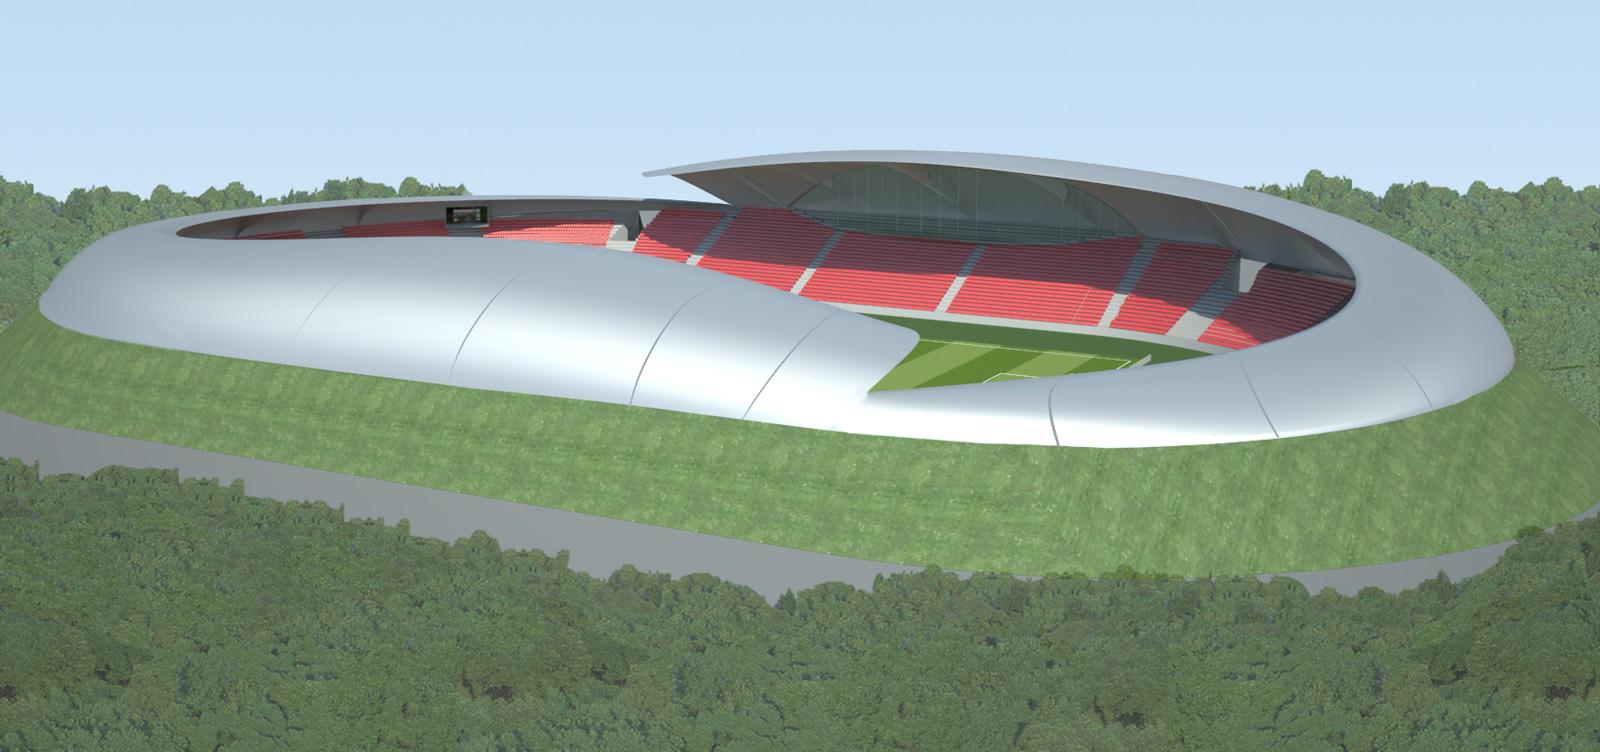 CSKA Sofia Soccer Stadium Remodel / by Design Initiatives